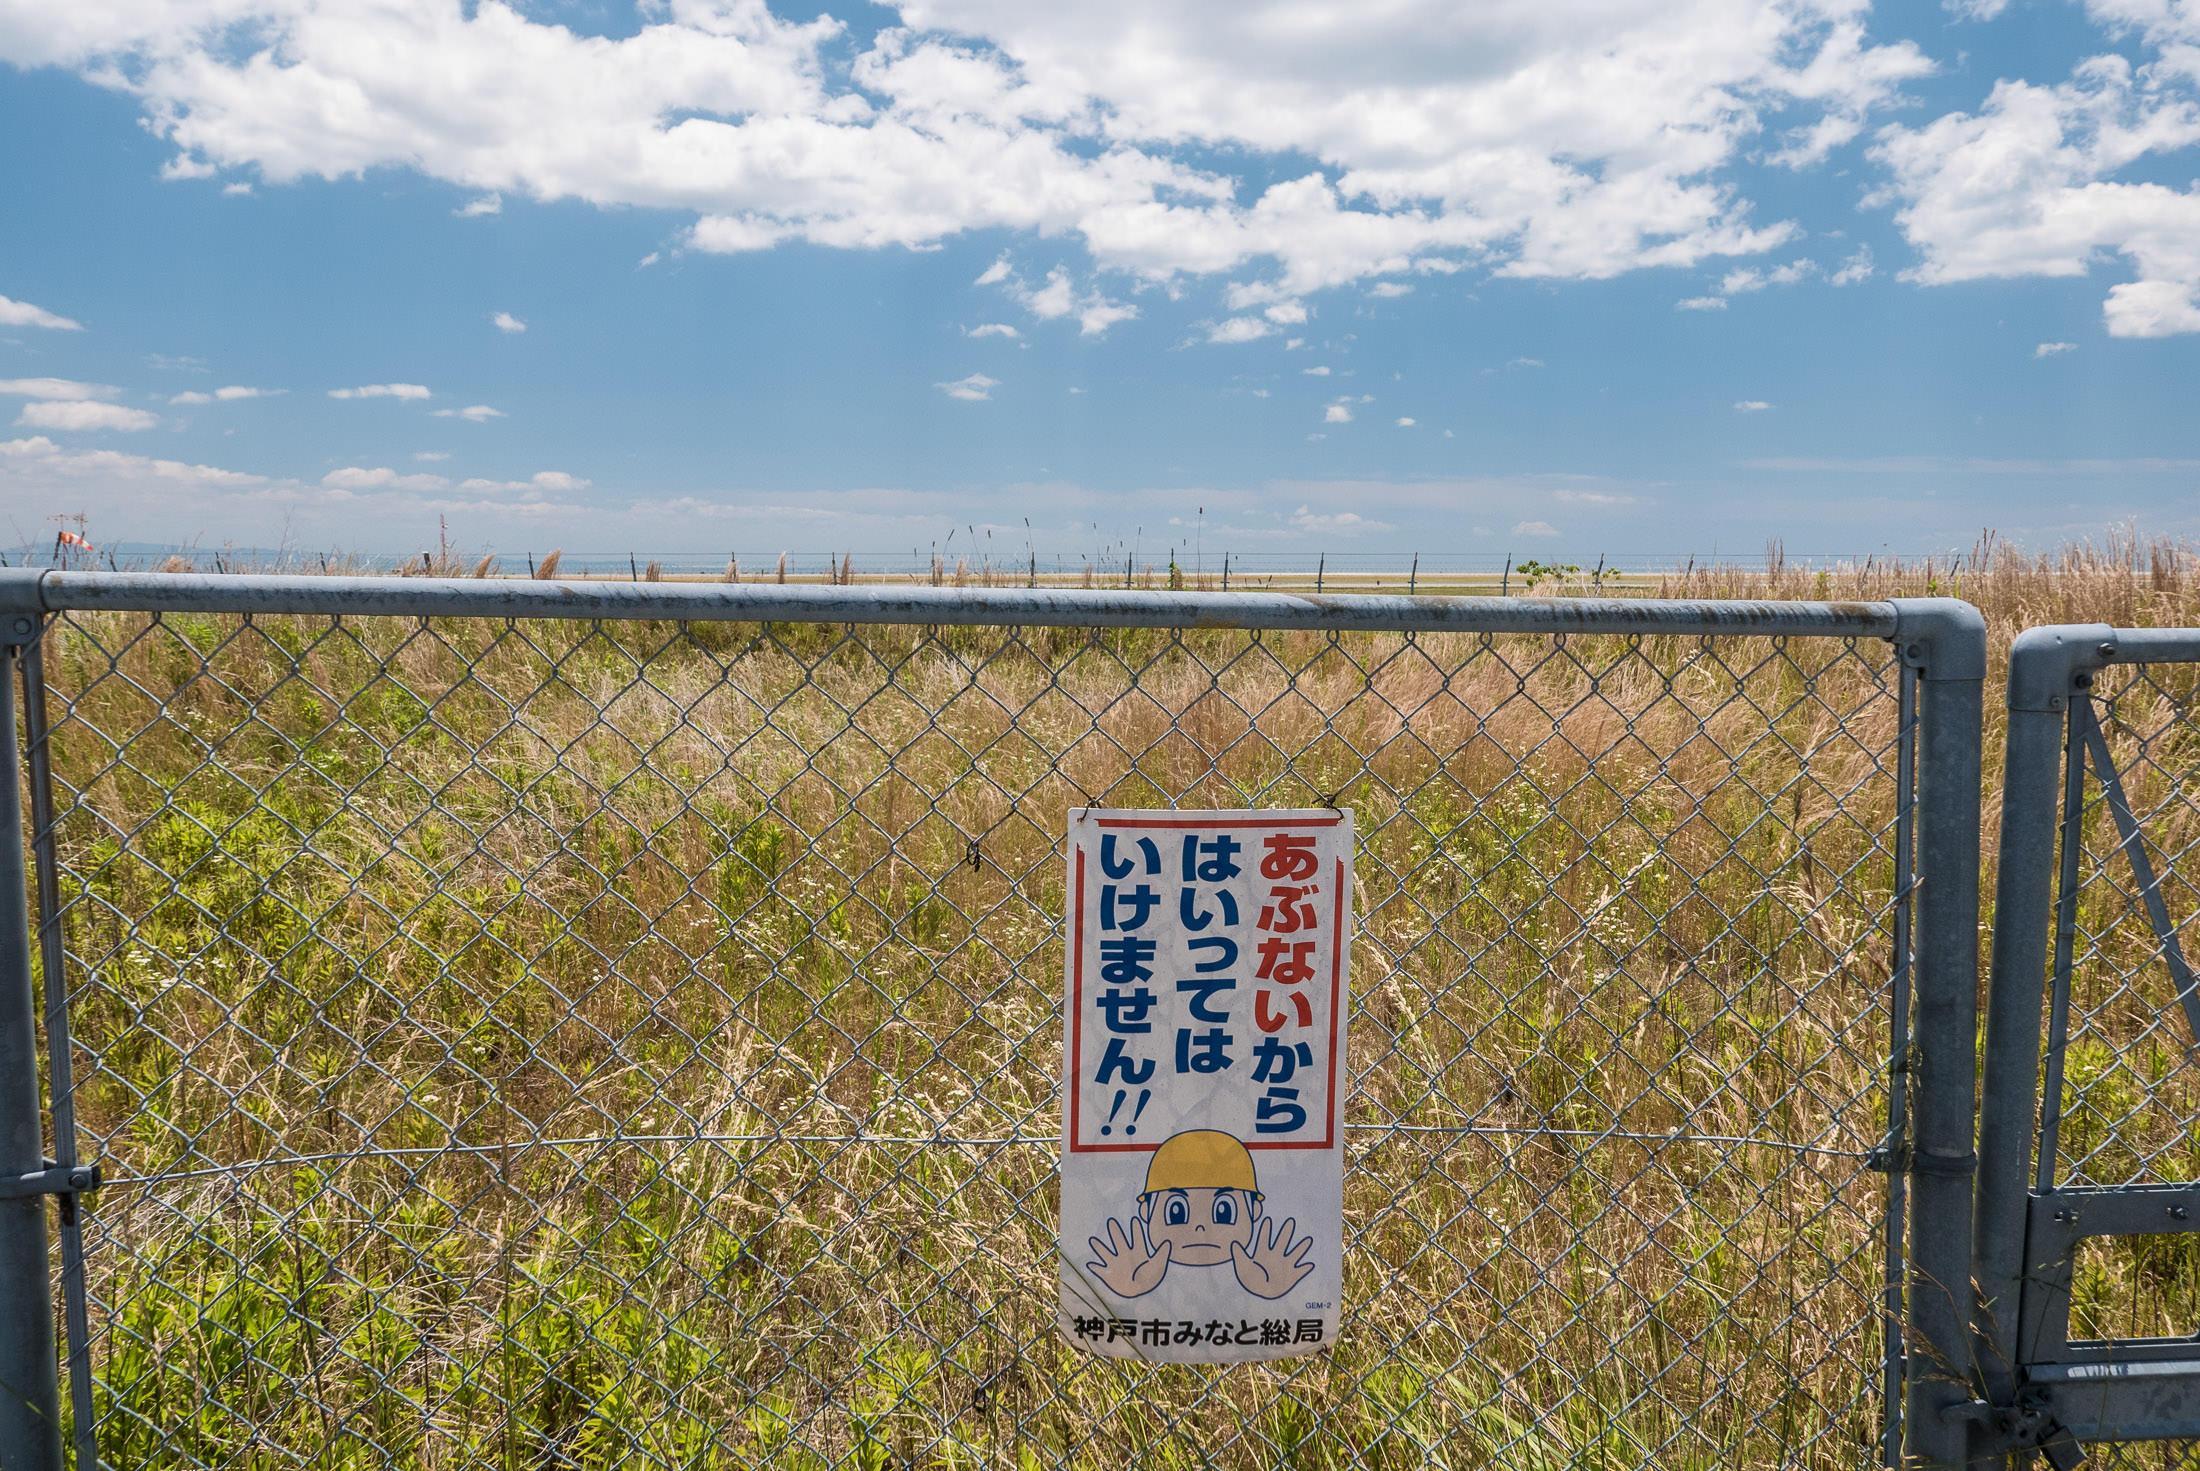 Jeffrey Friedl's Blog » My First Climb up Kobe's Mt  Rokko